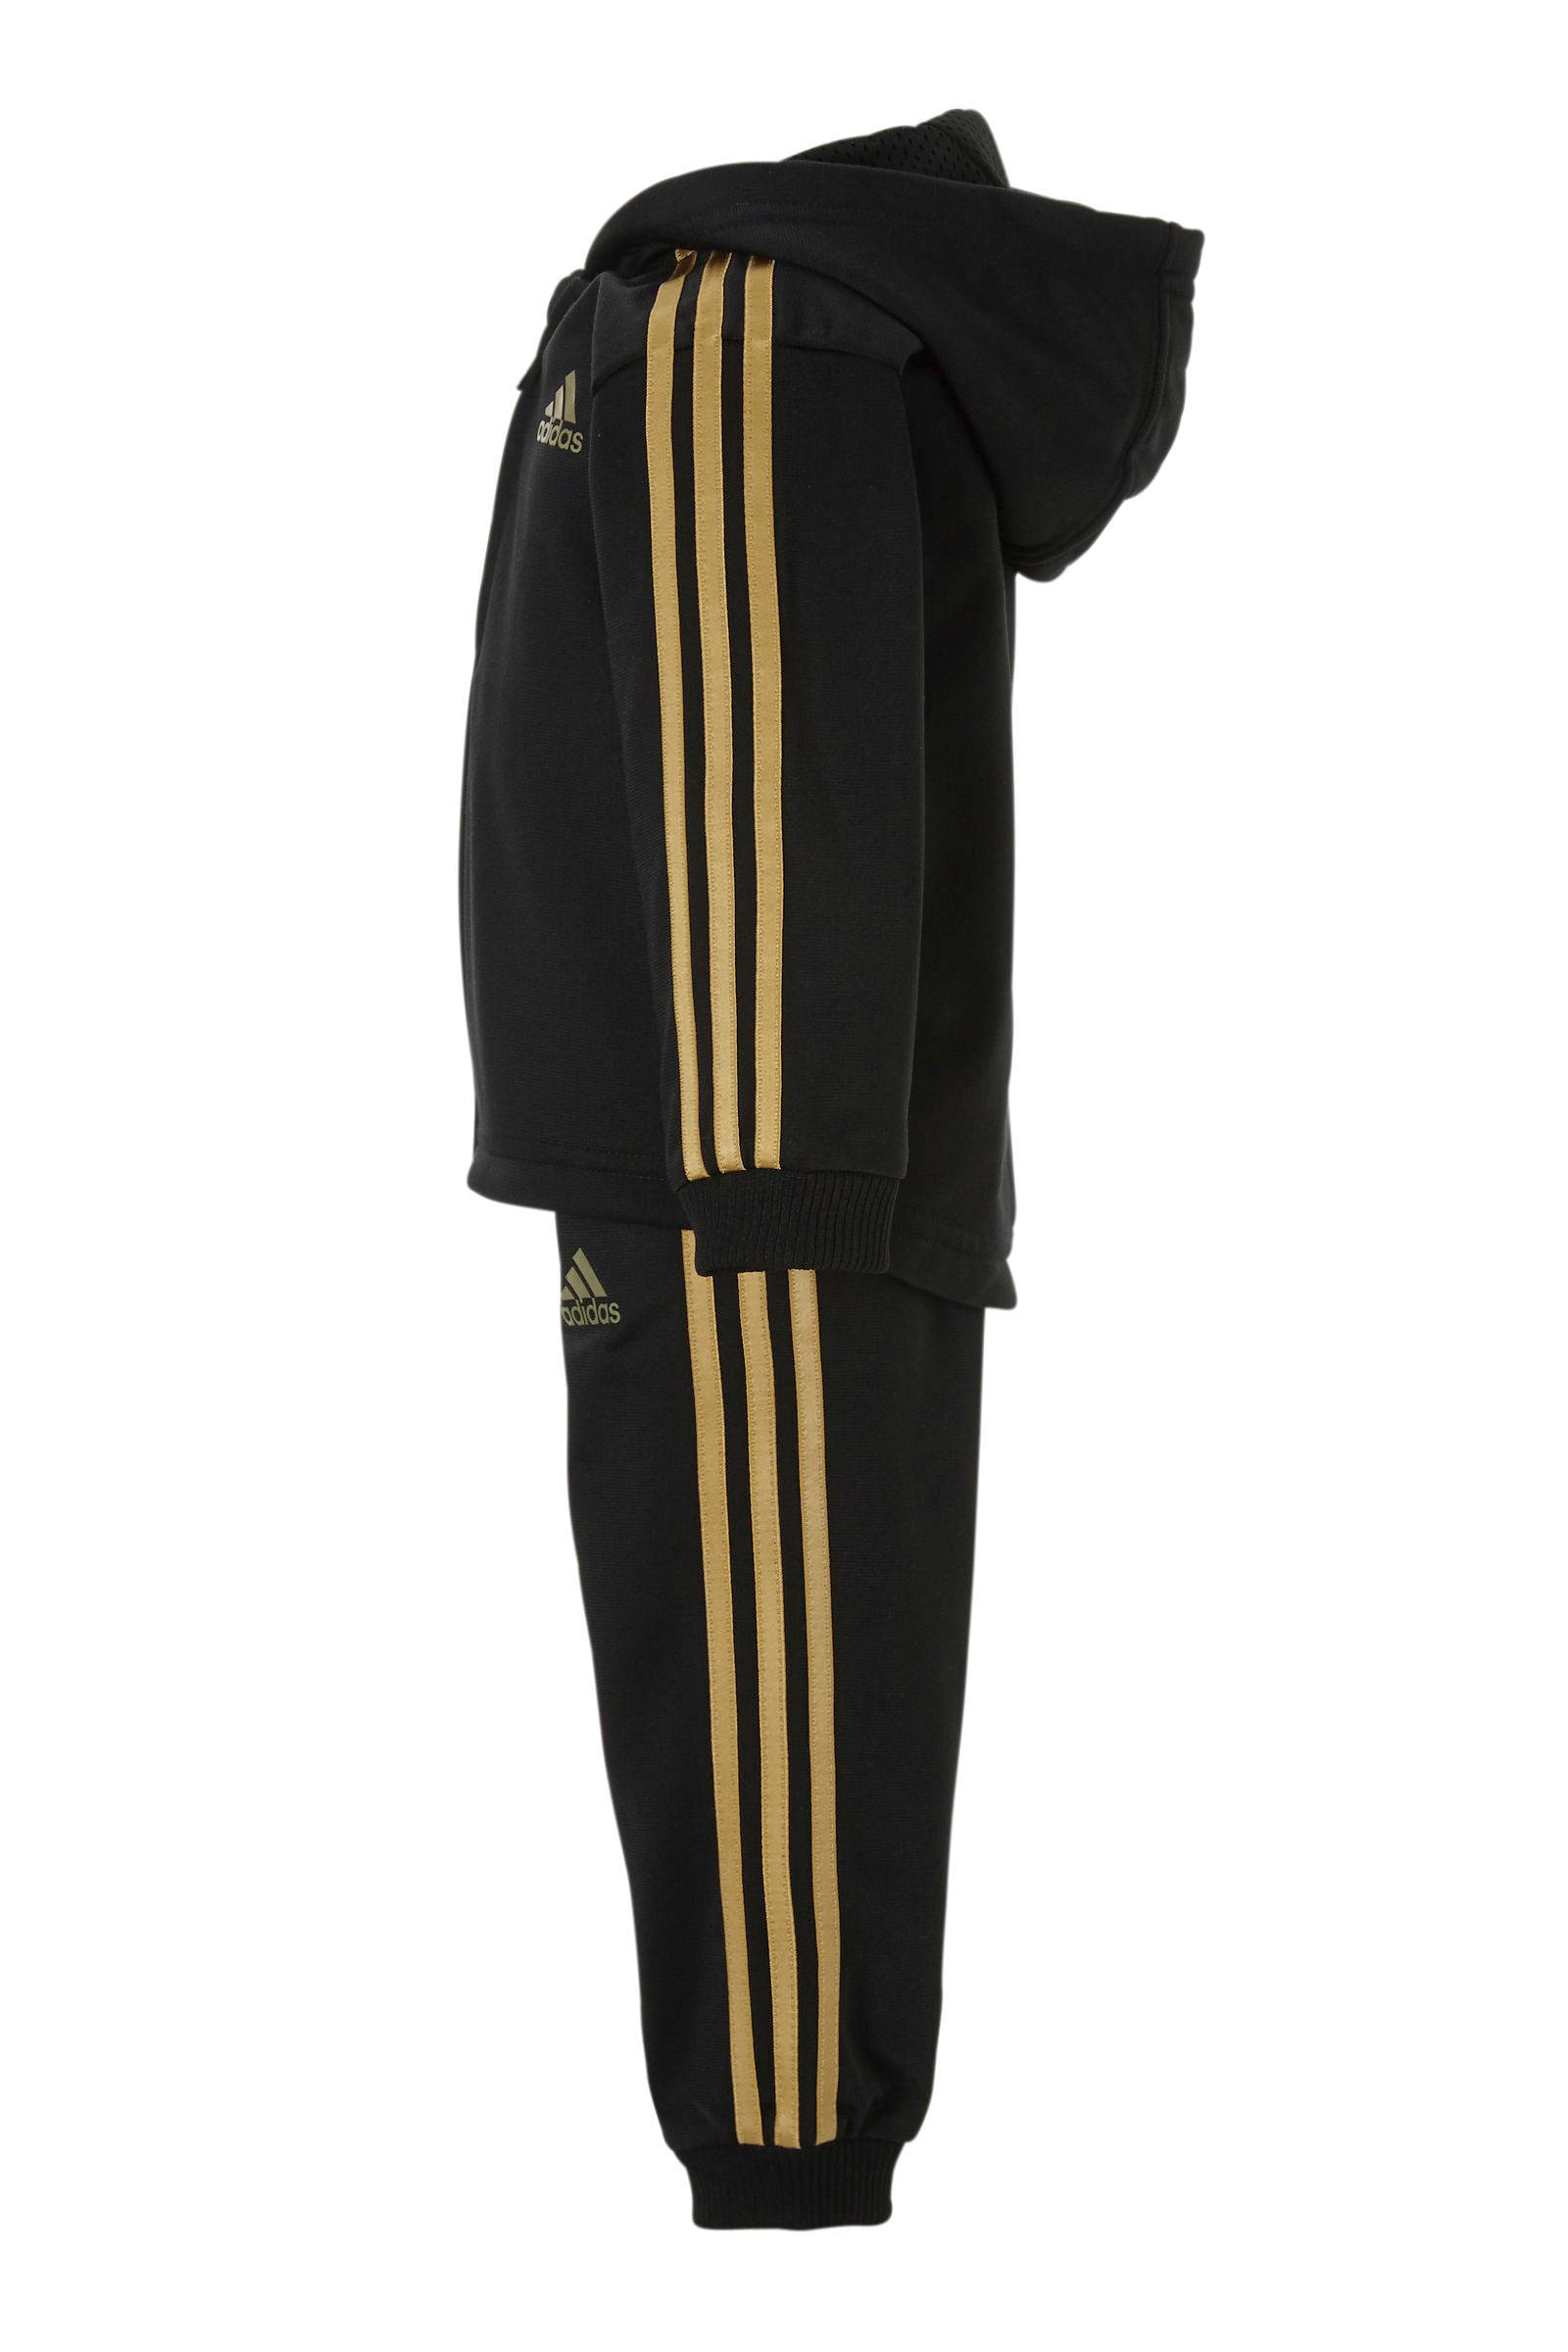 adidas trainingspak heren zwart goud